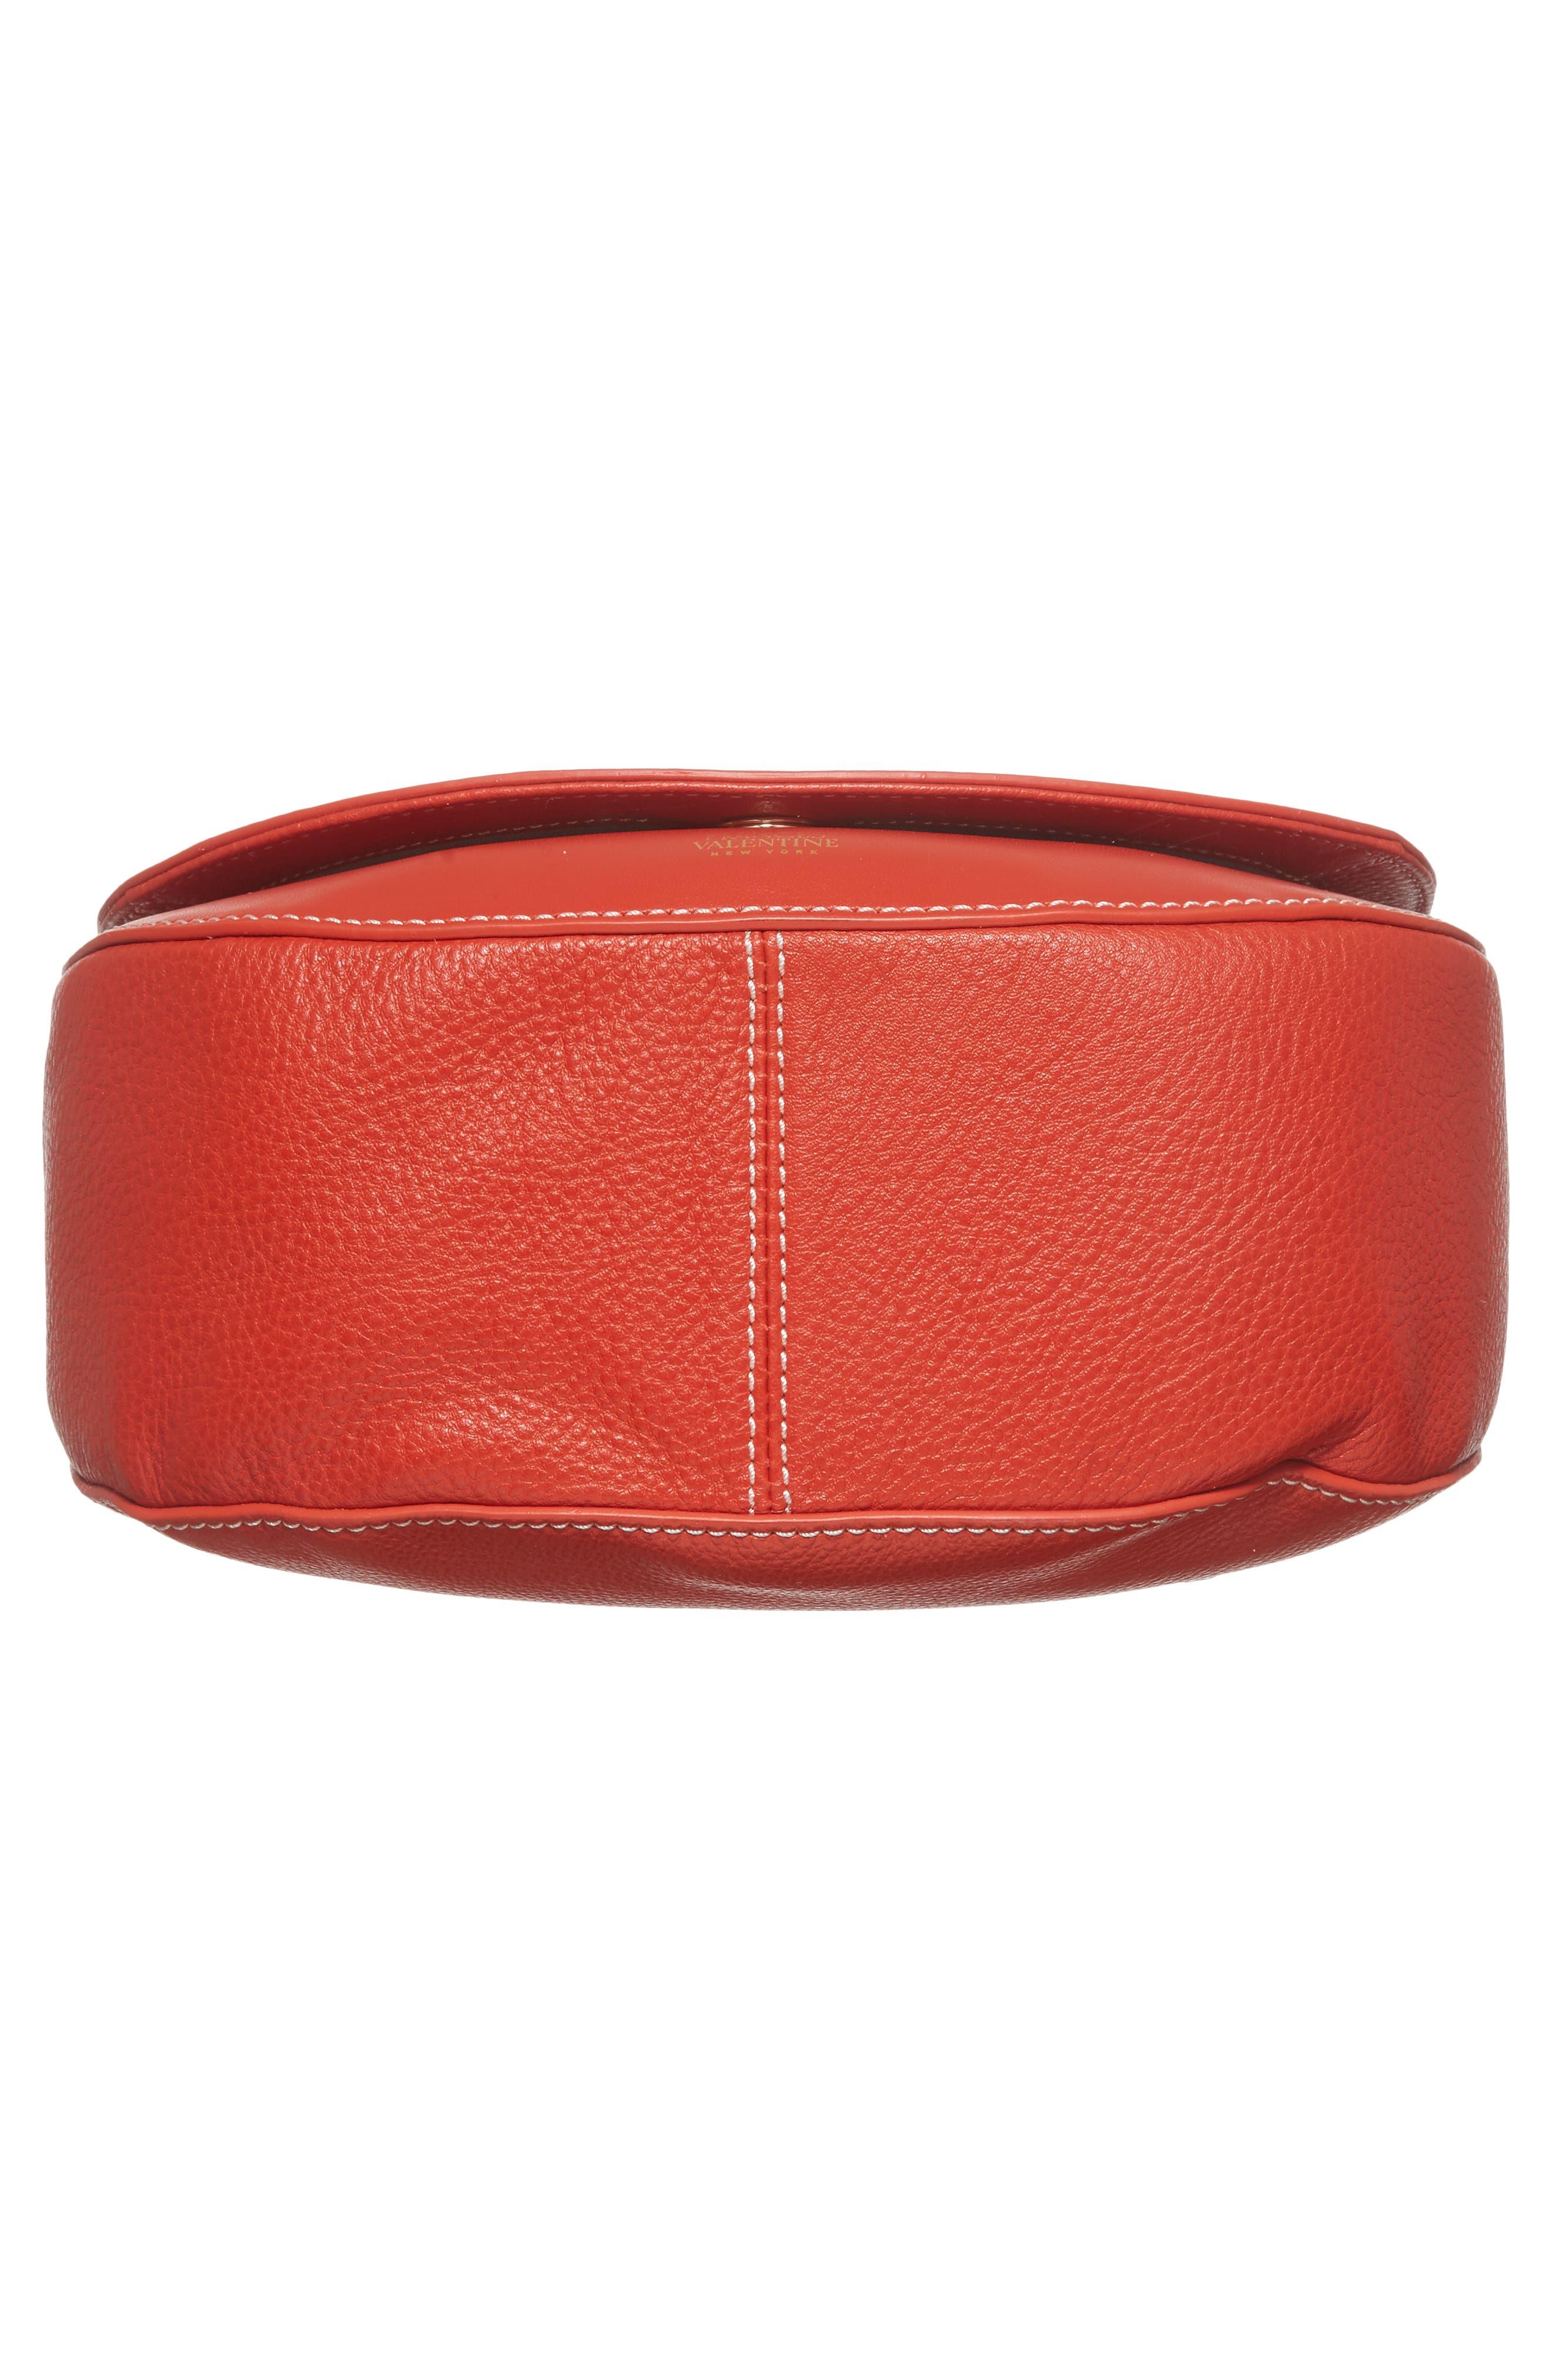 Small Ellen Leather Crossbody Bag,                             Alternate thumbnail 6, color,                             Coral